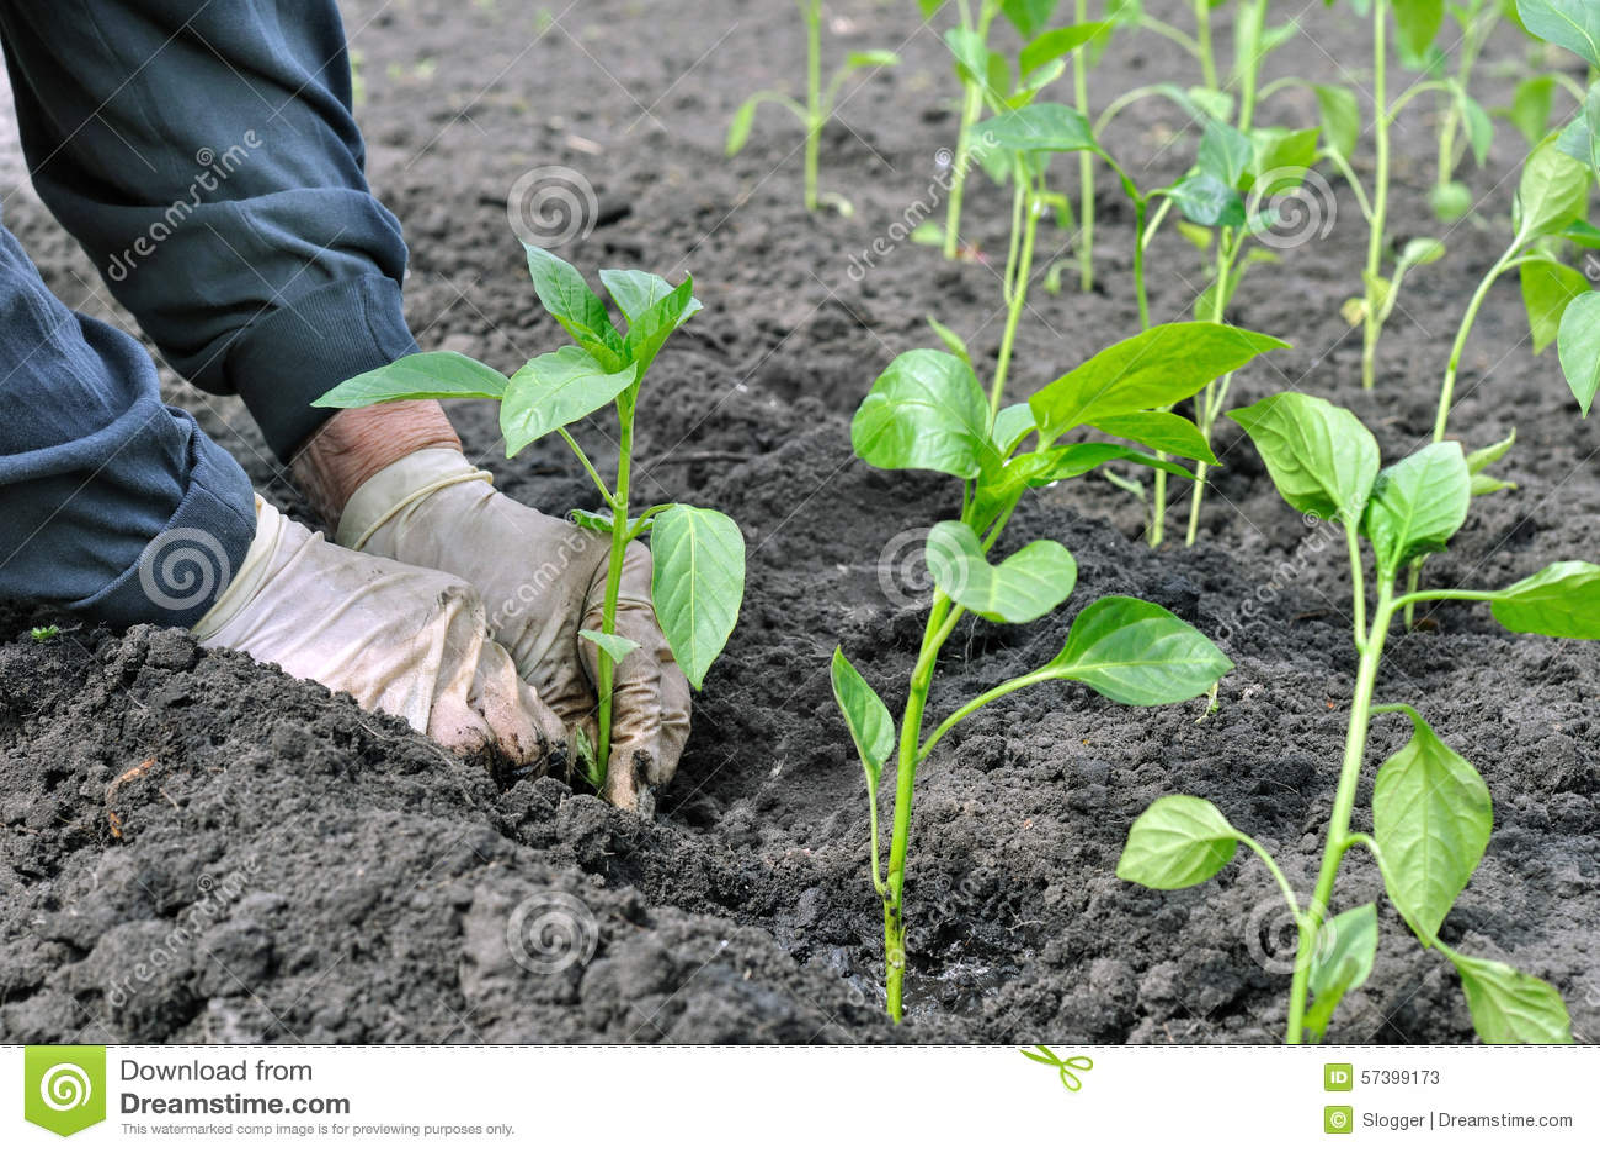 Vegetable garden business plan